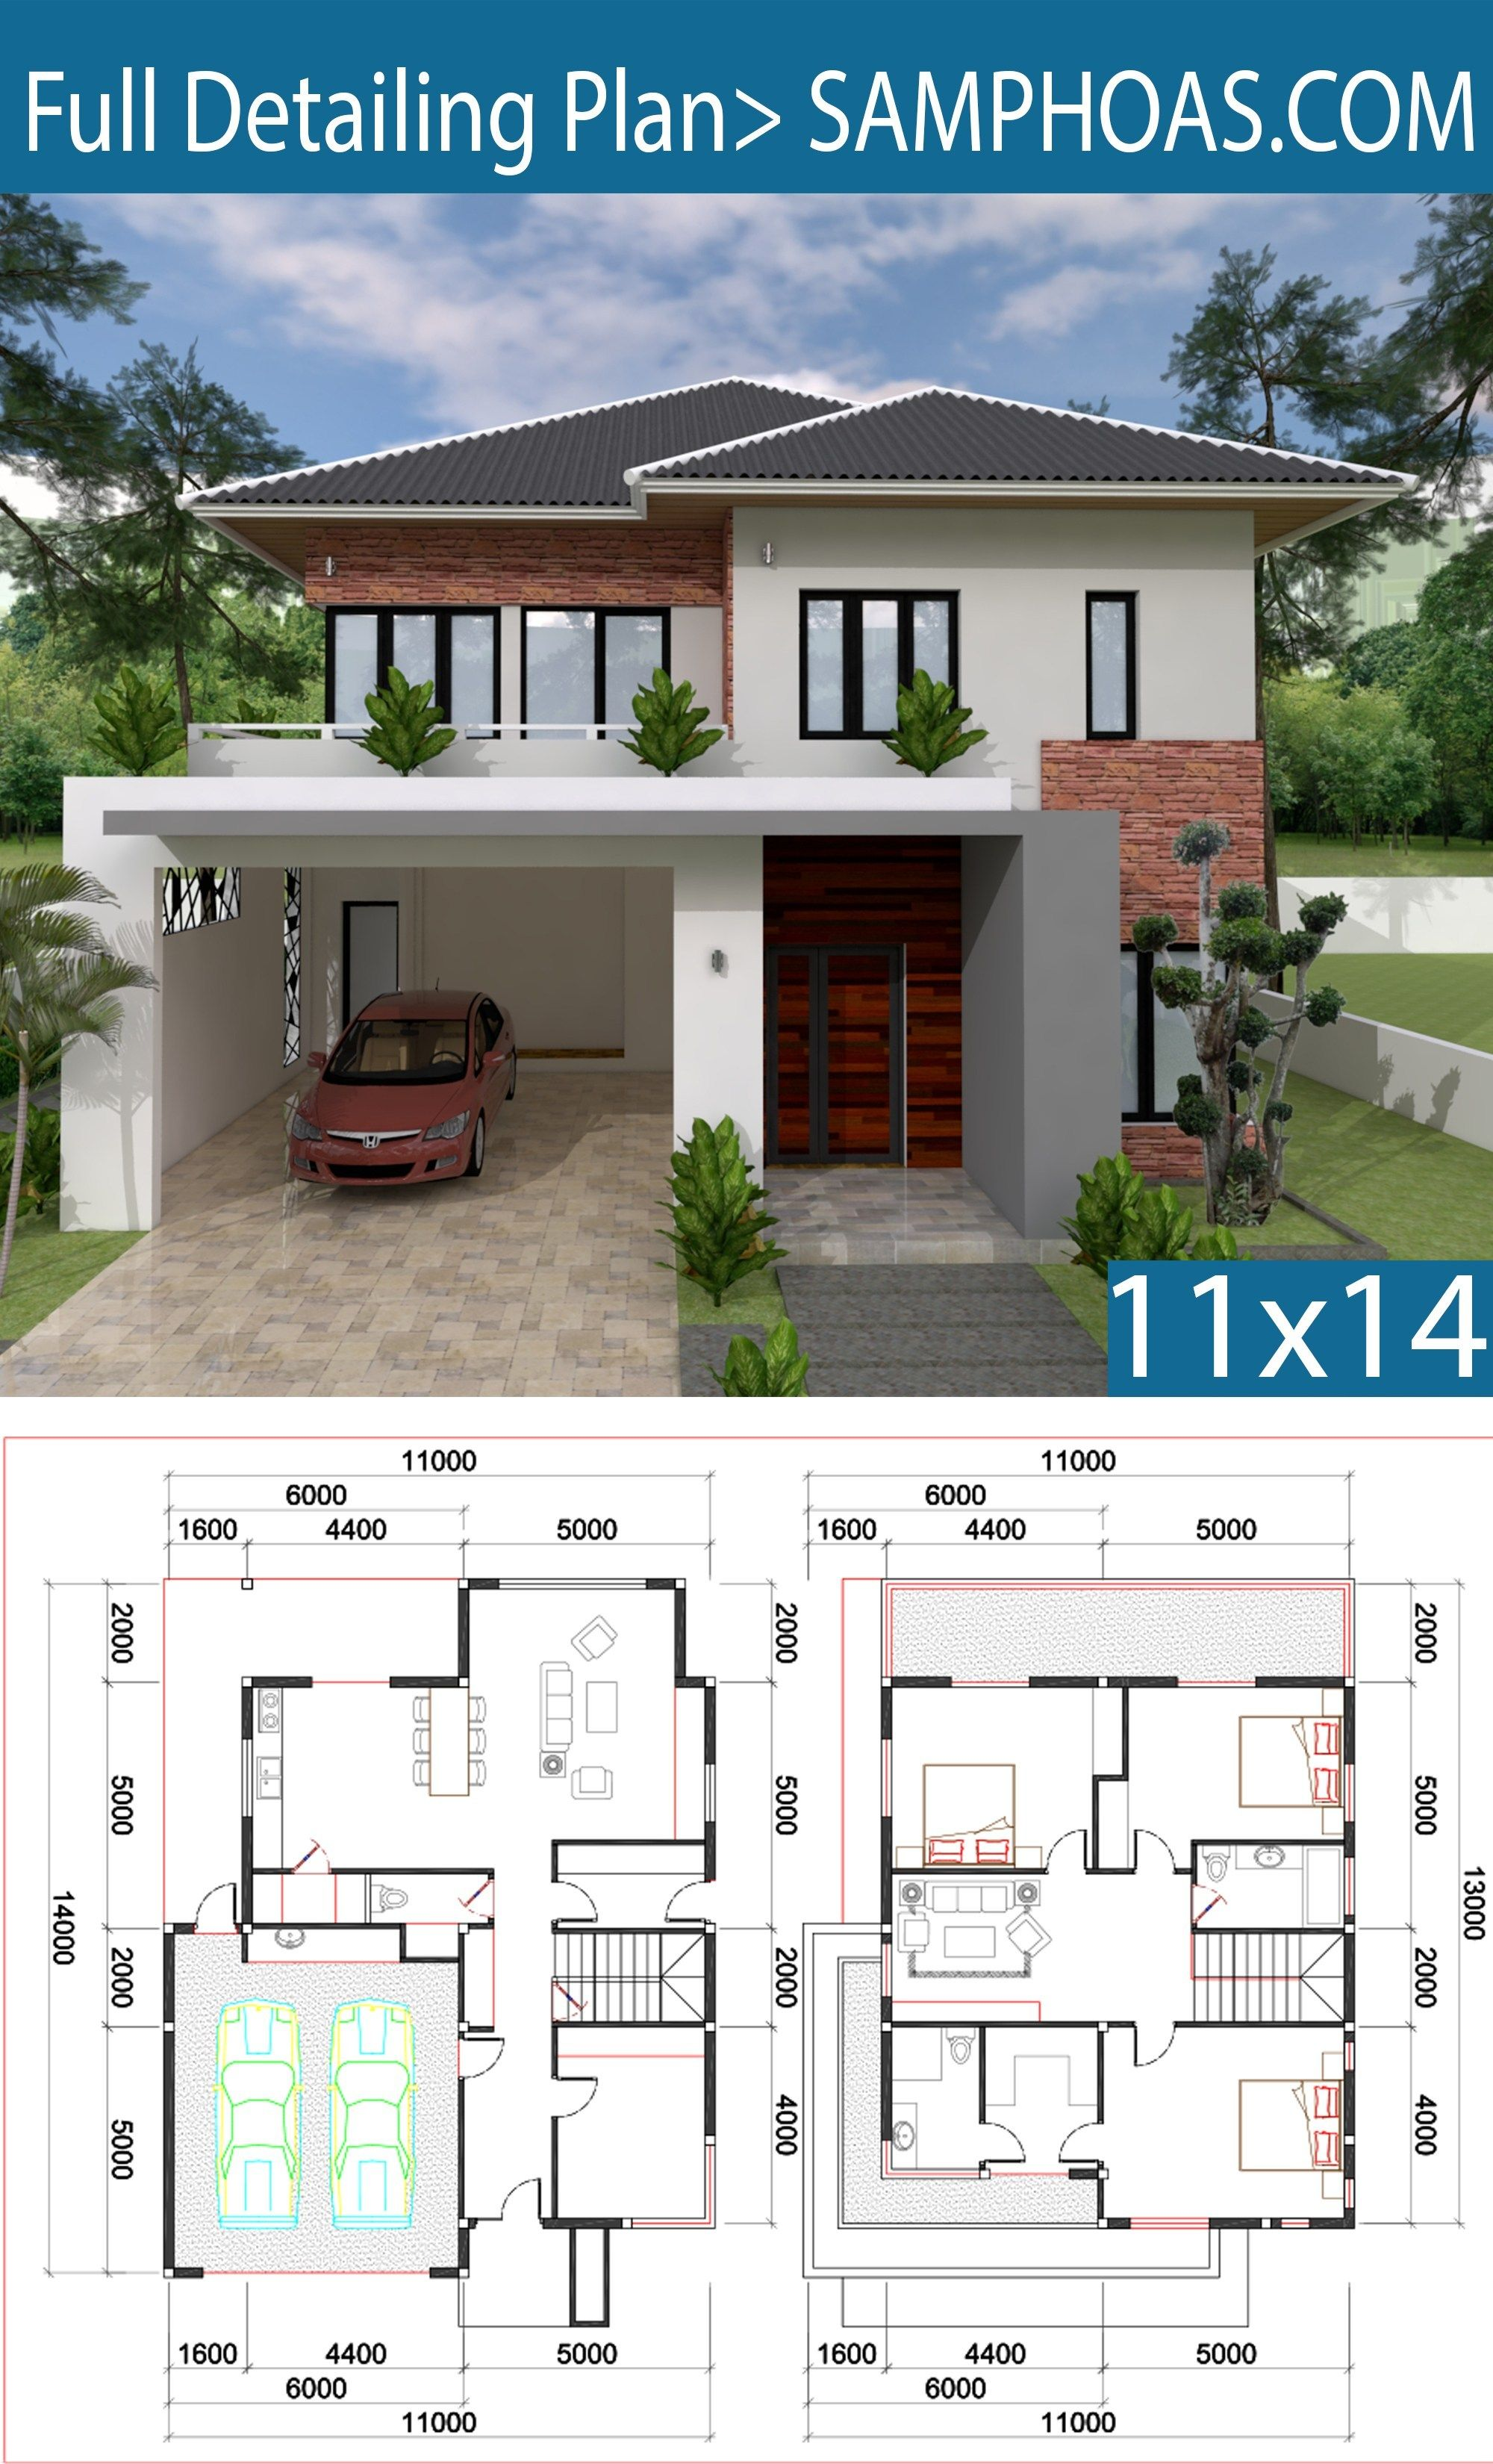 3 Bedroom Villa Design 11x13m Samphoas Plan Villa Design Model House Plan House Construction Plan